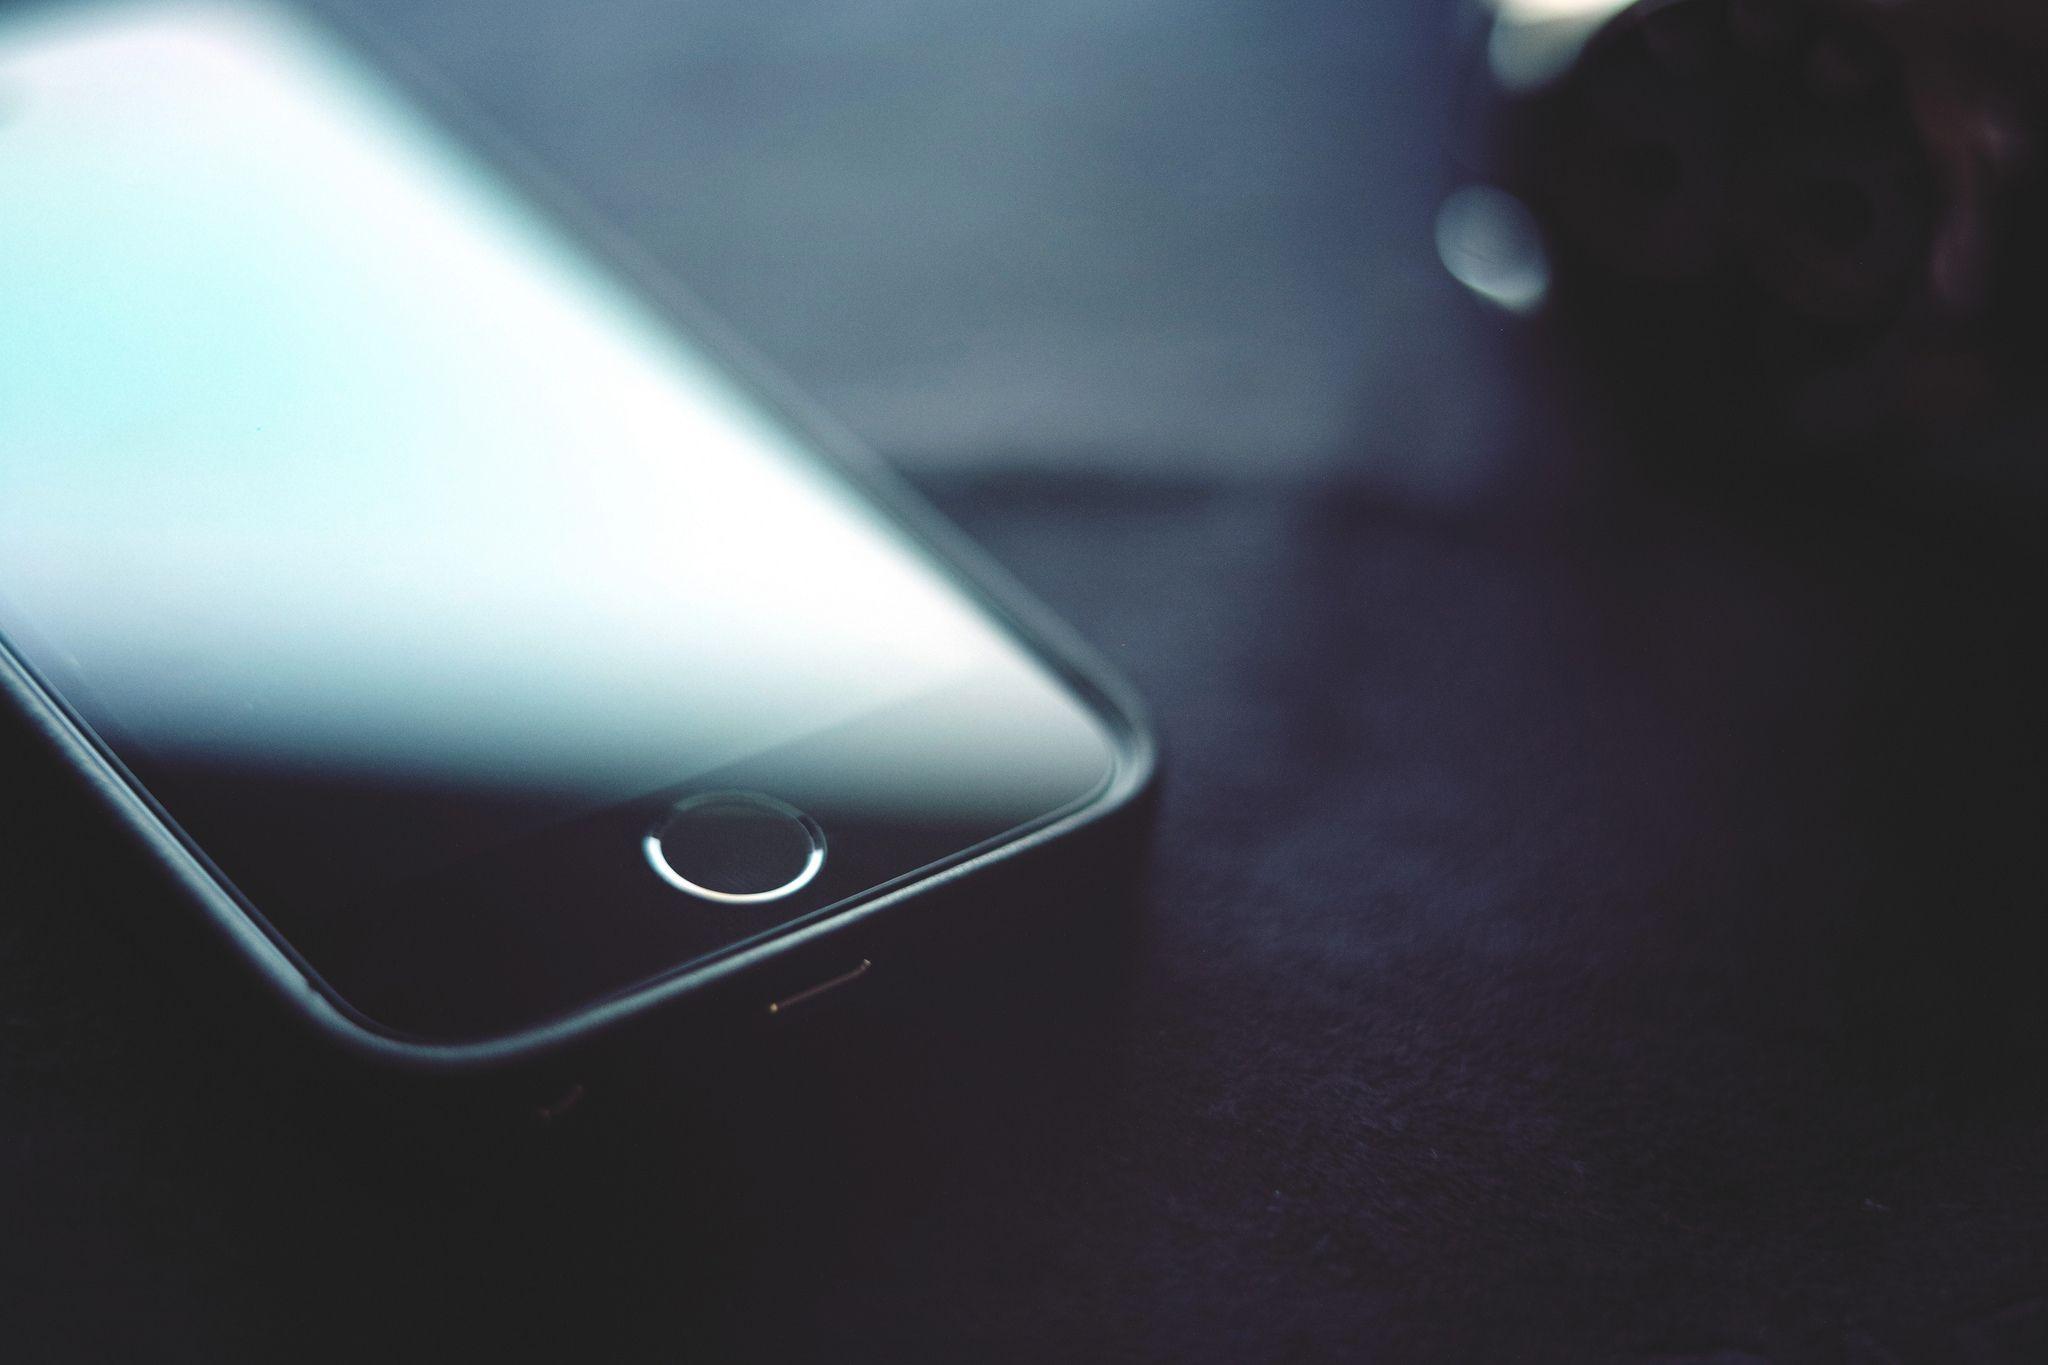 Closeup iPhone Telephone Smartphone 5s